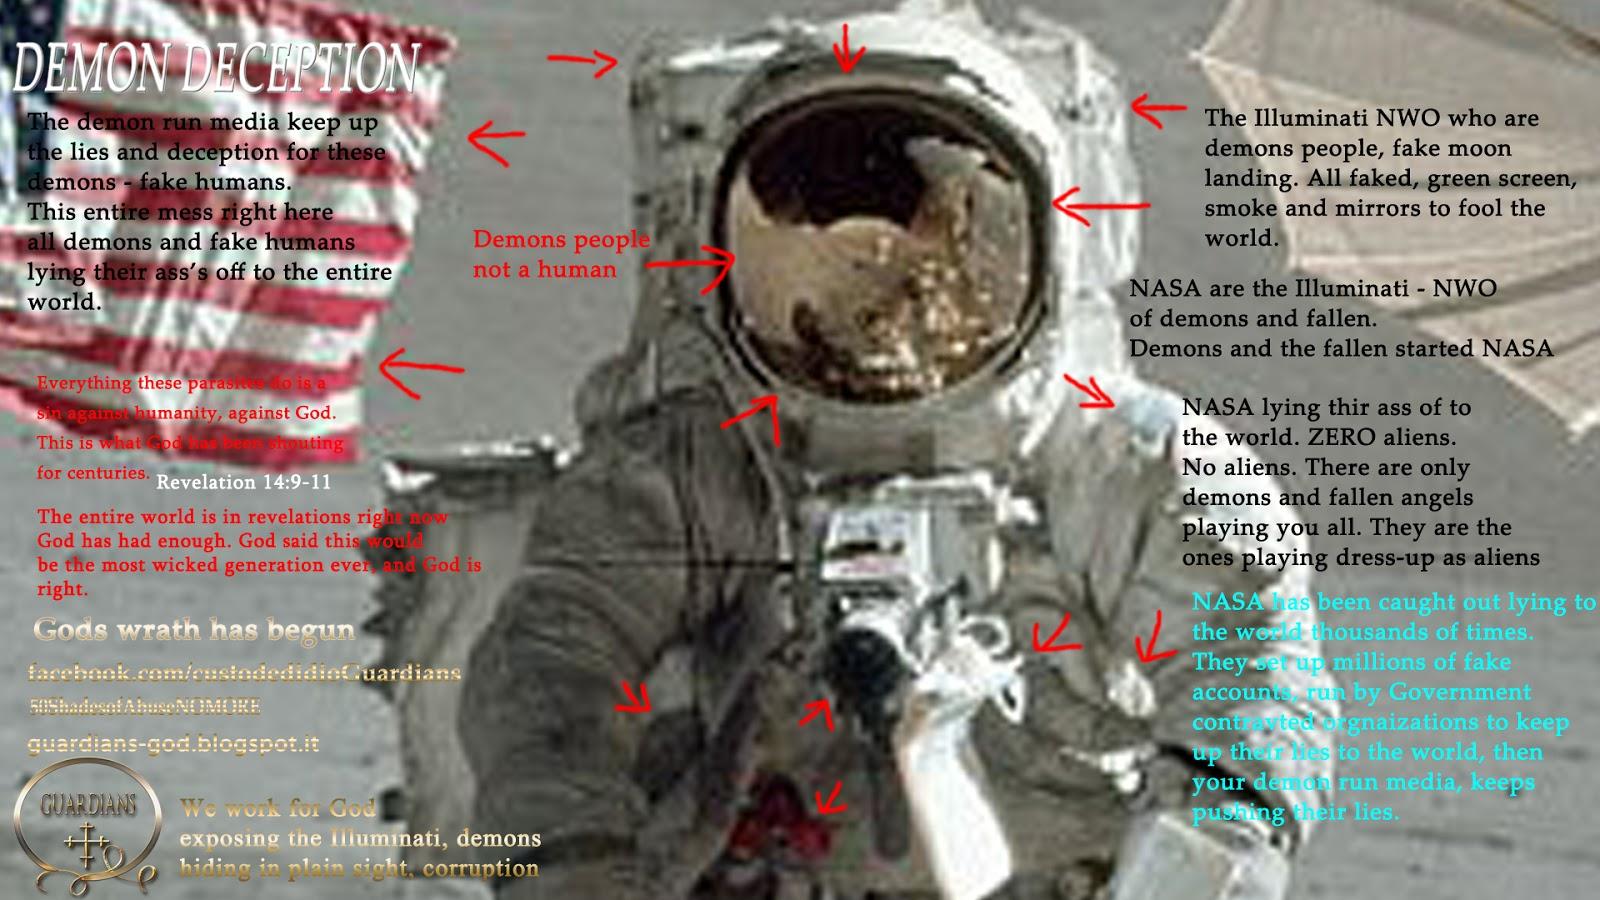 GUARDIANS: Secret Space Program run by the Illuminati NWO demons